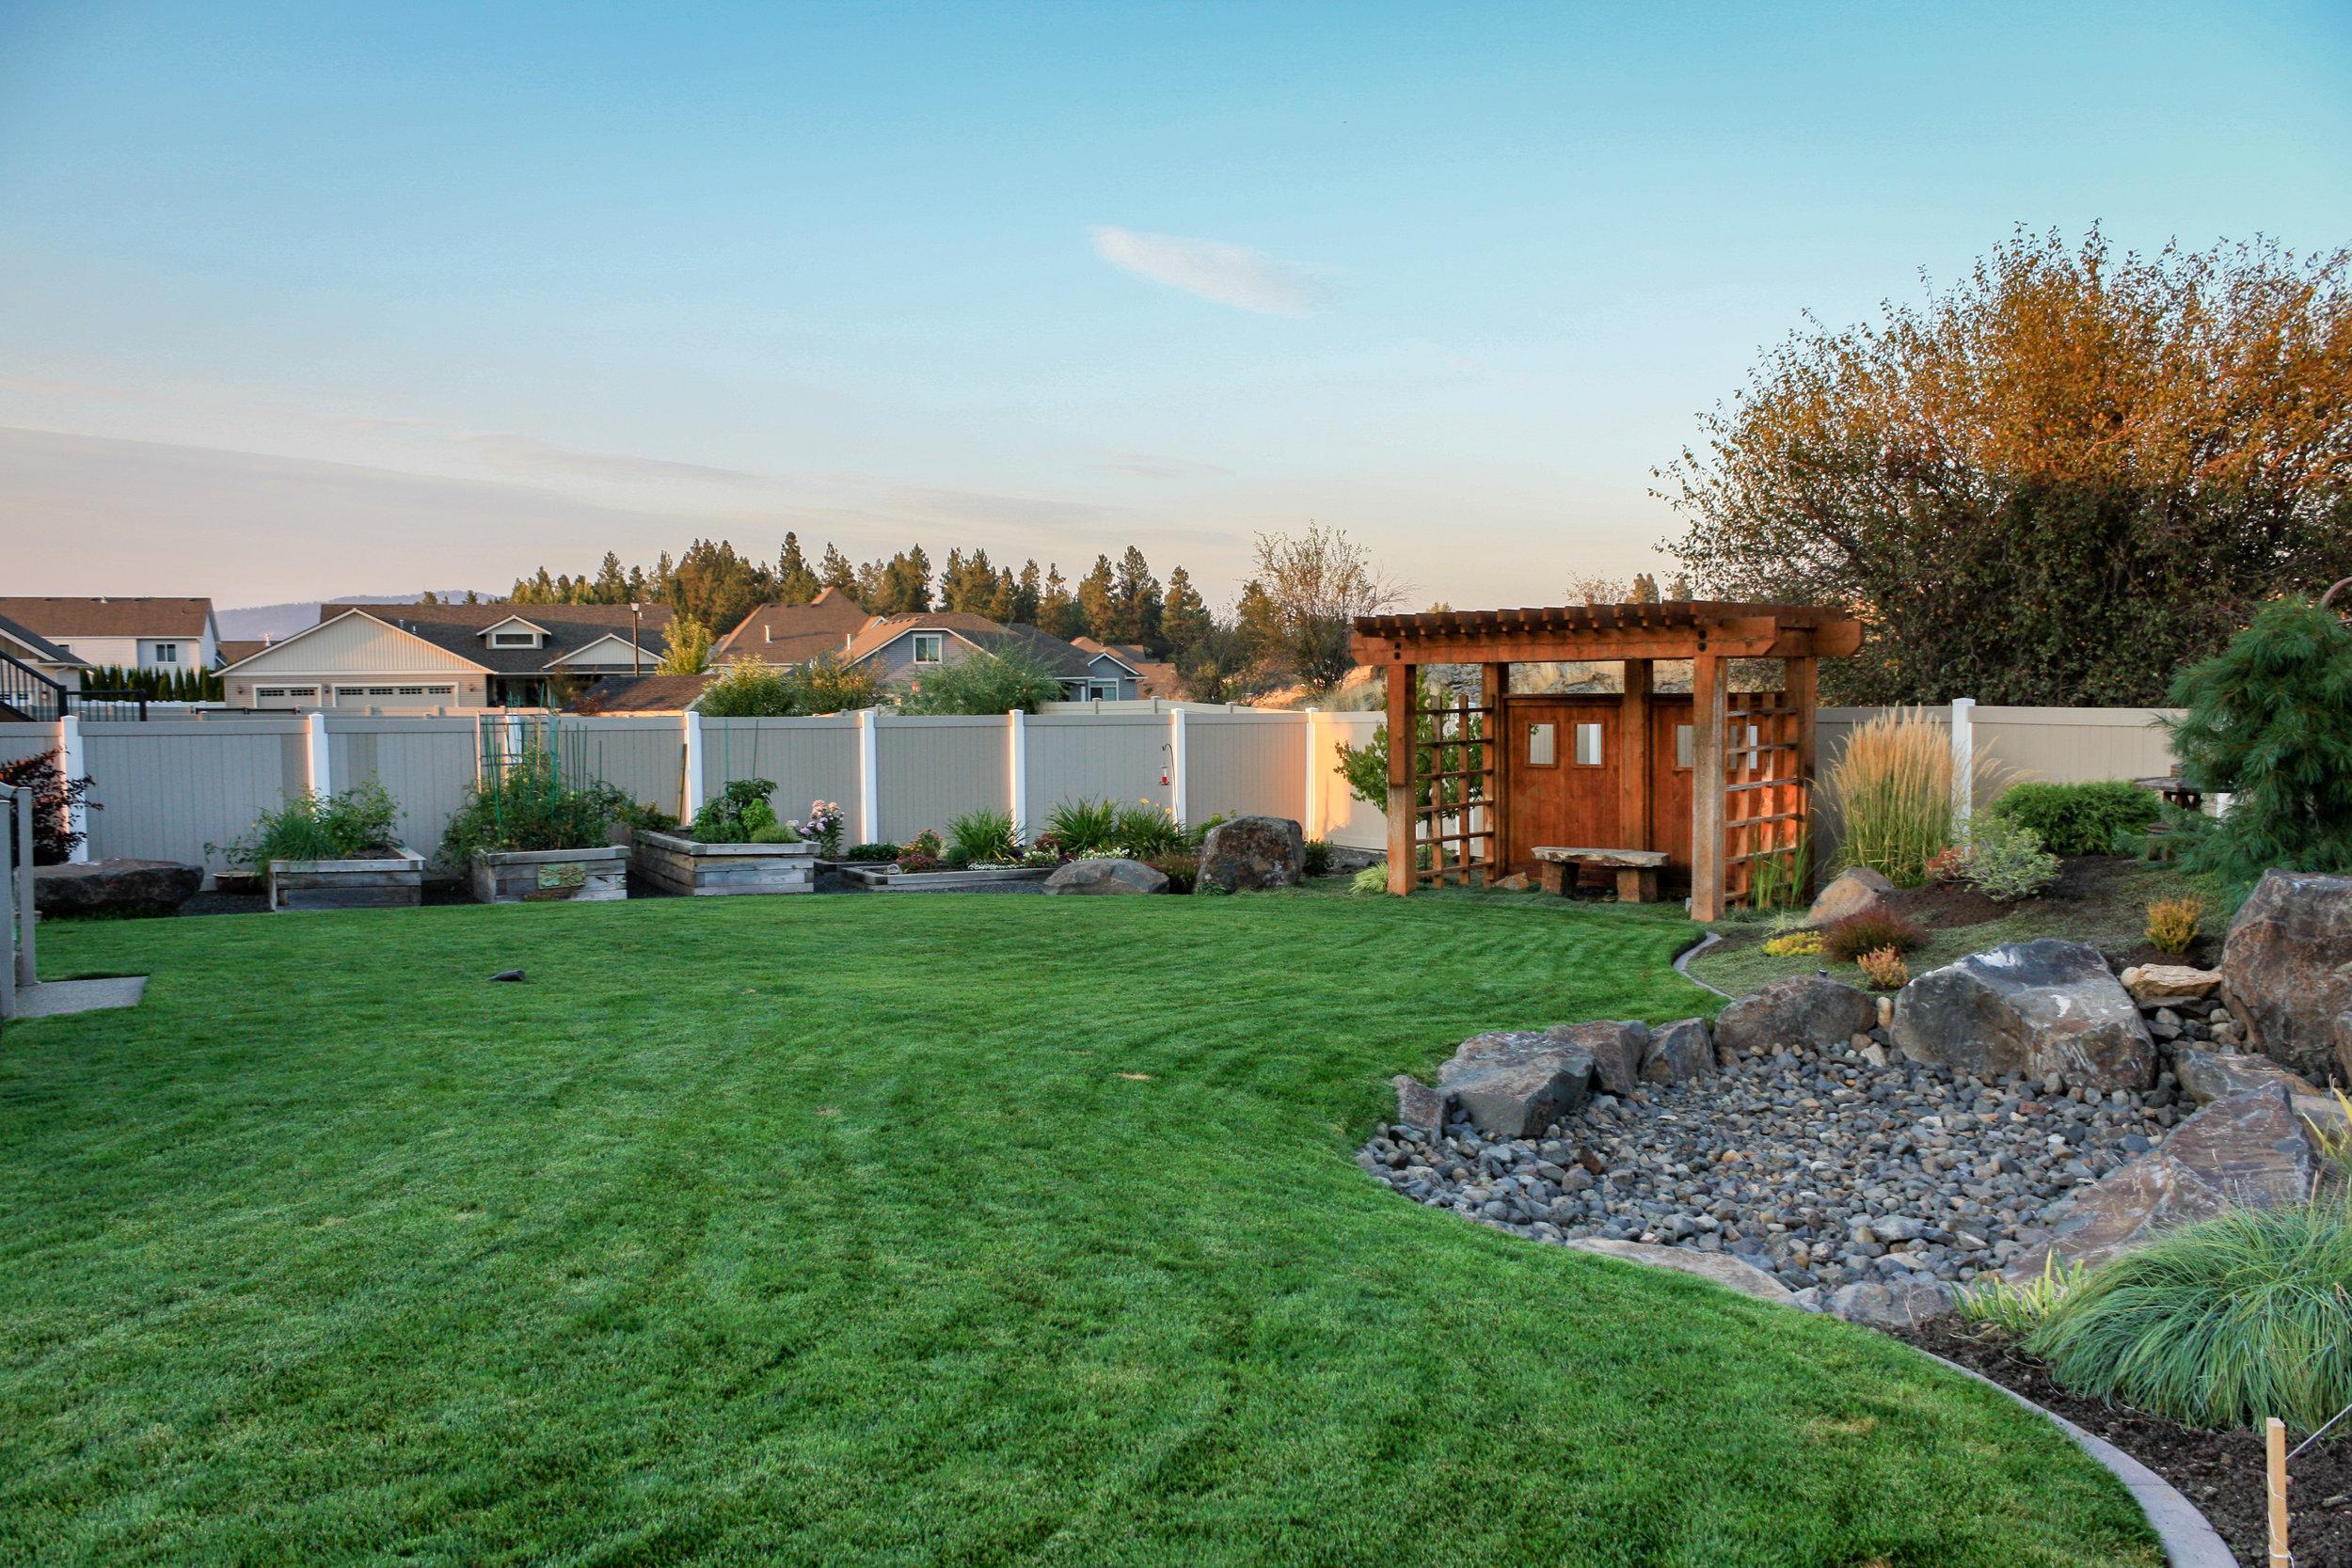 spokane valley landscaping with garden beds